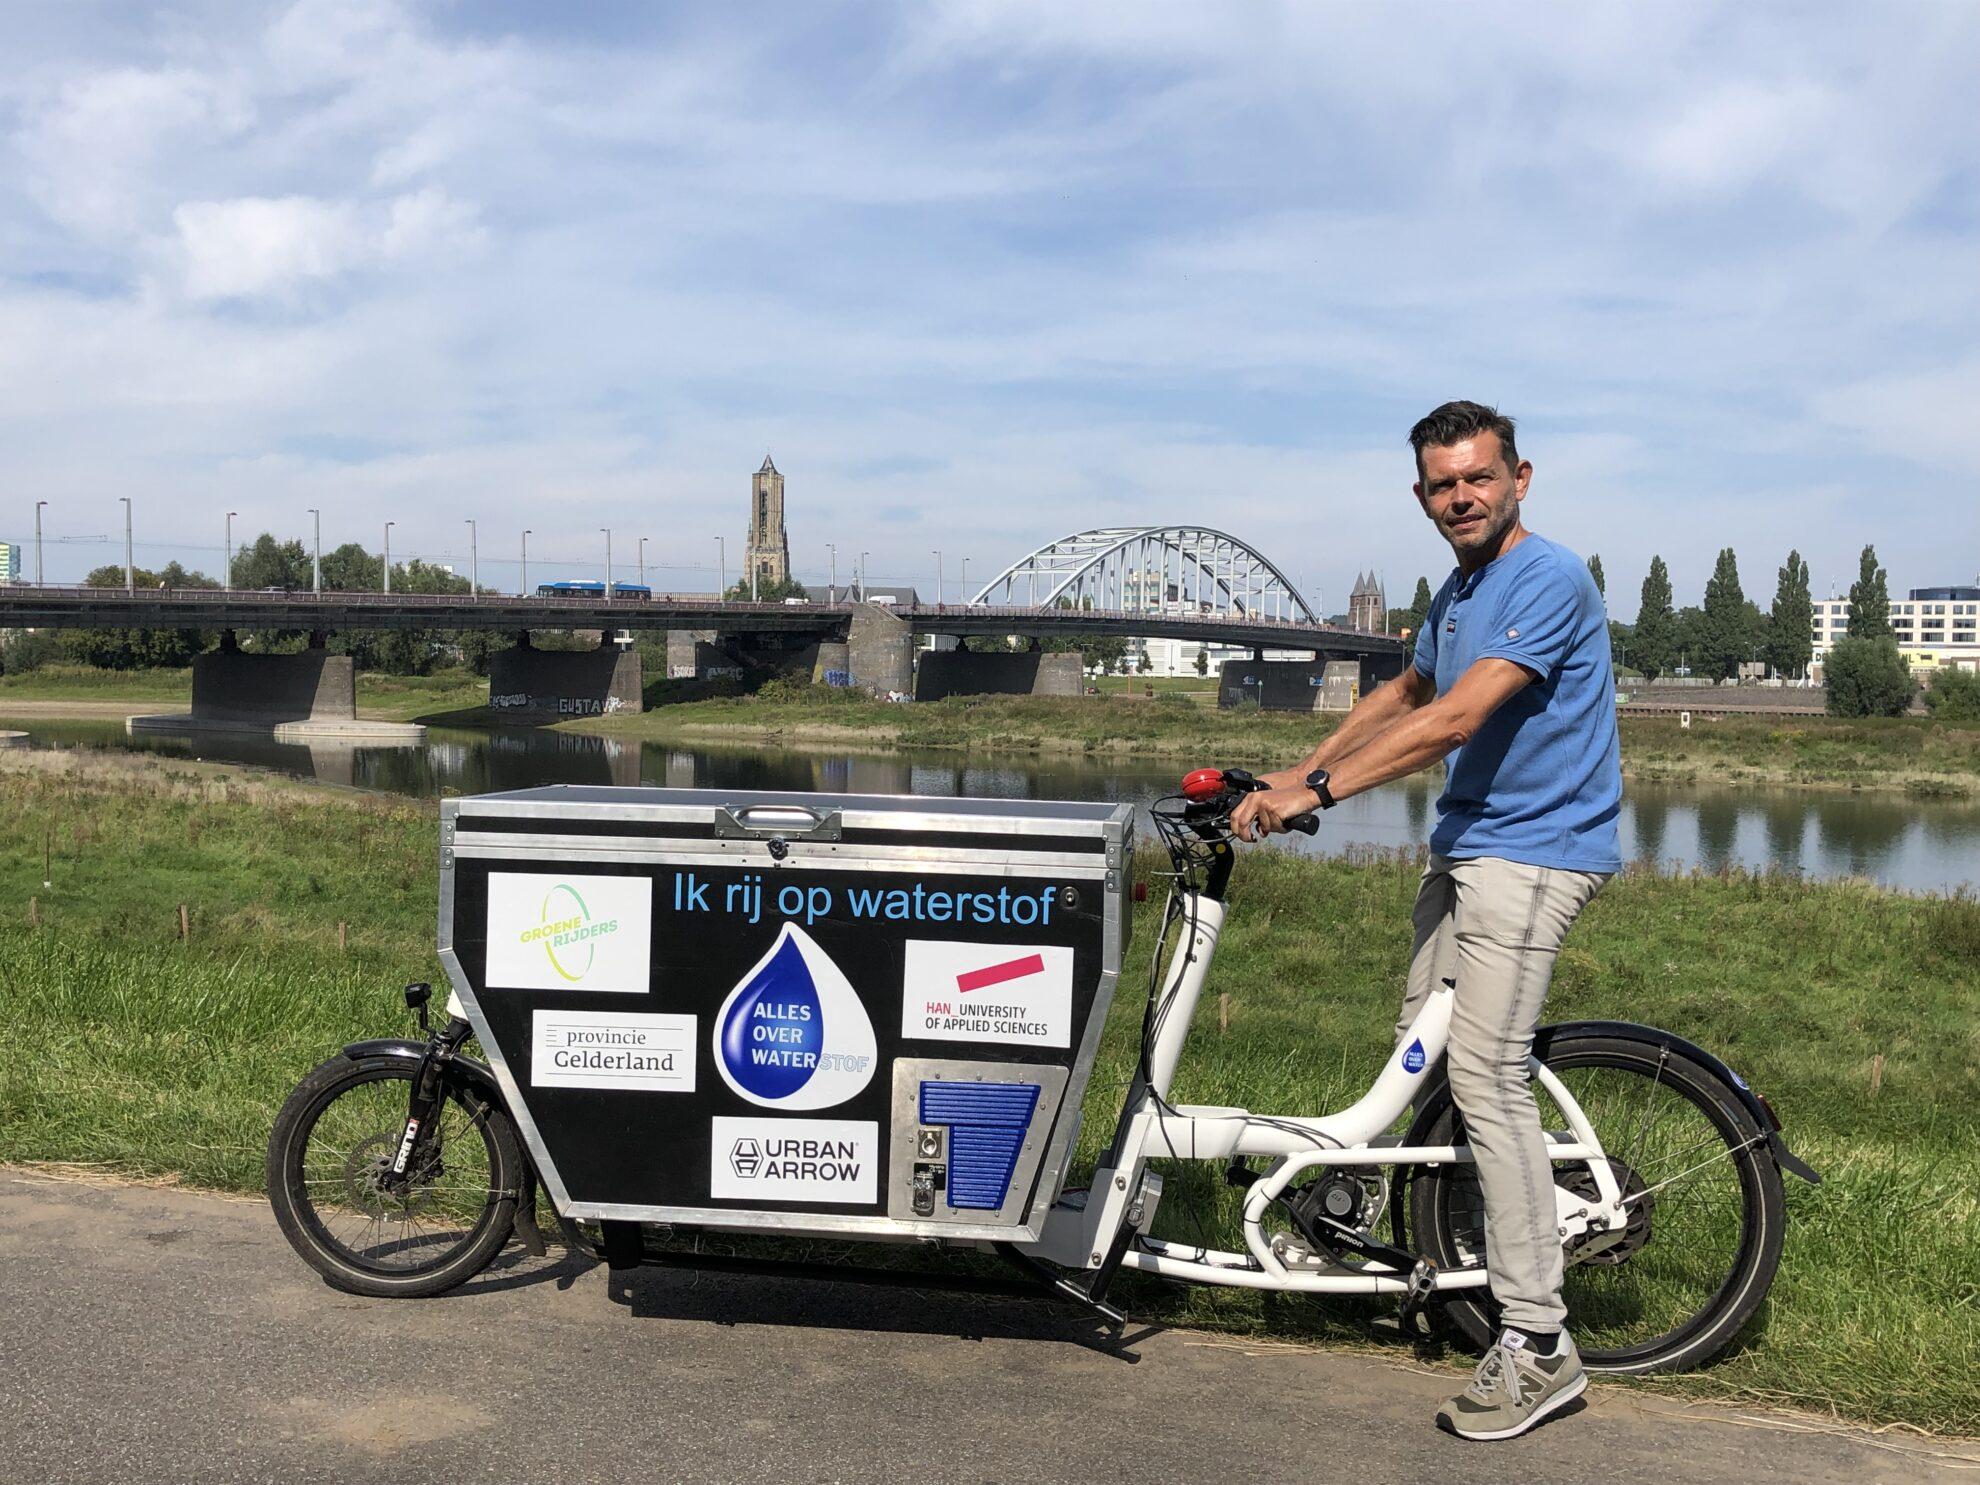 Prototype Nederlandse HydroCargo bakfiets onthuld